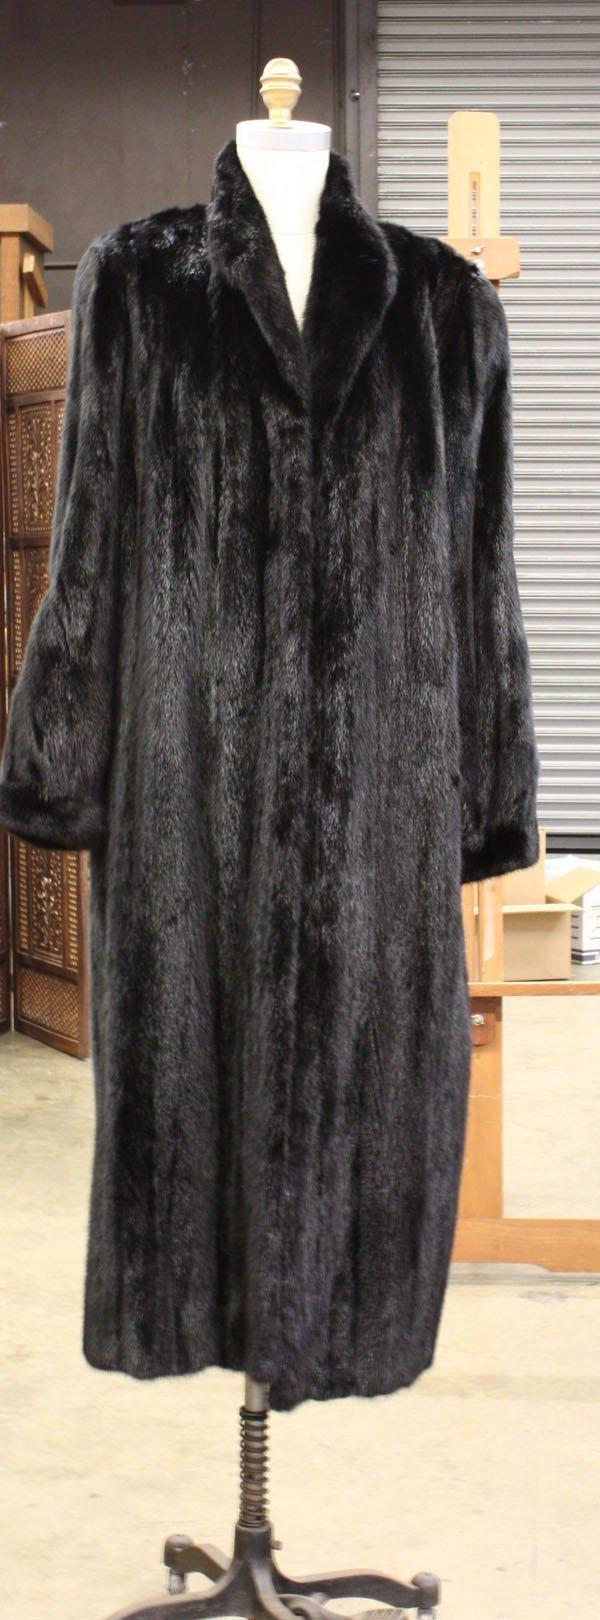 4254: Dennis Basso full black mink coat